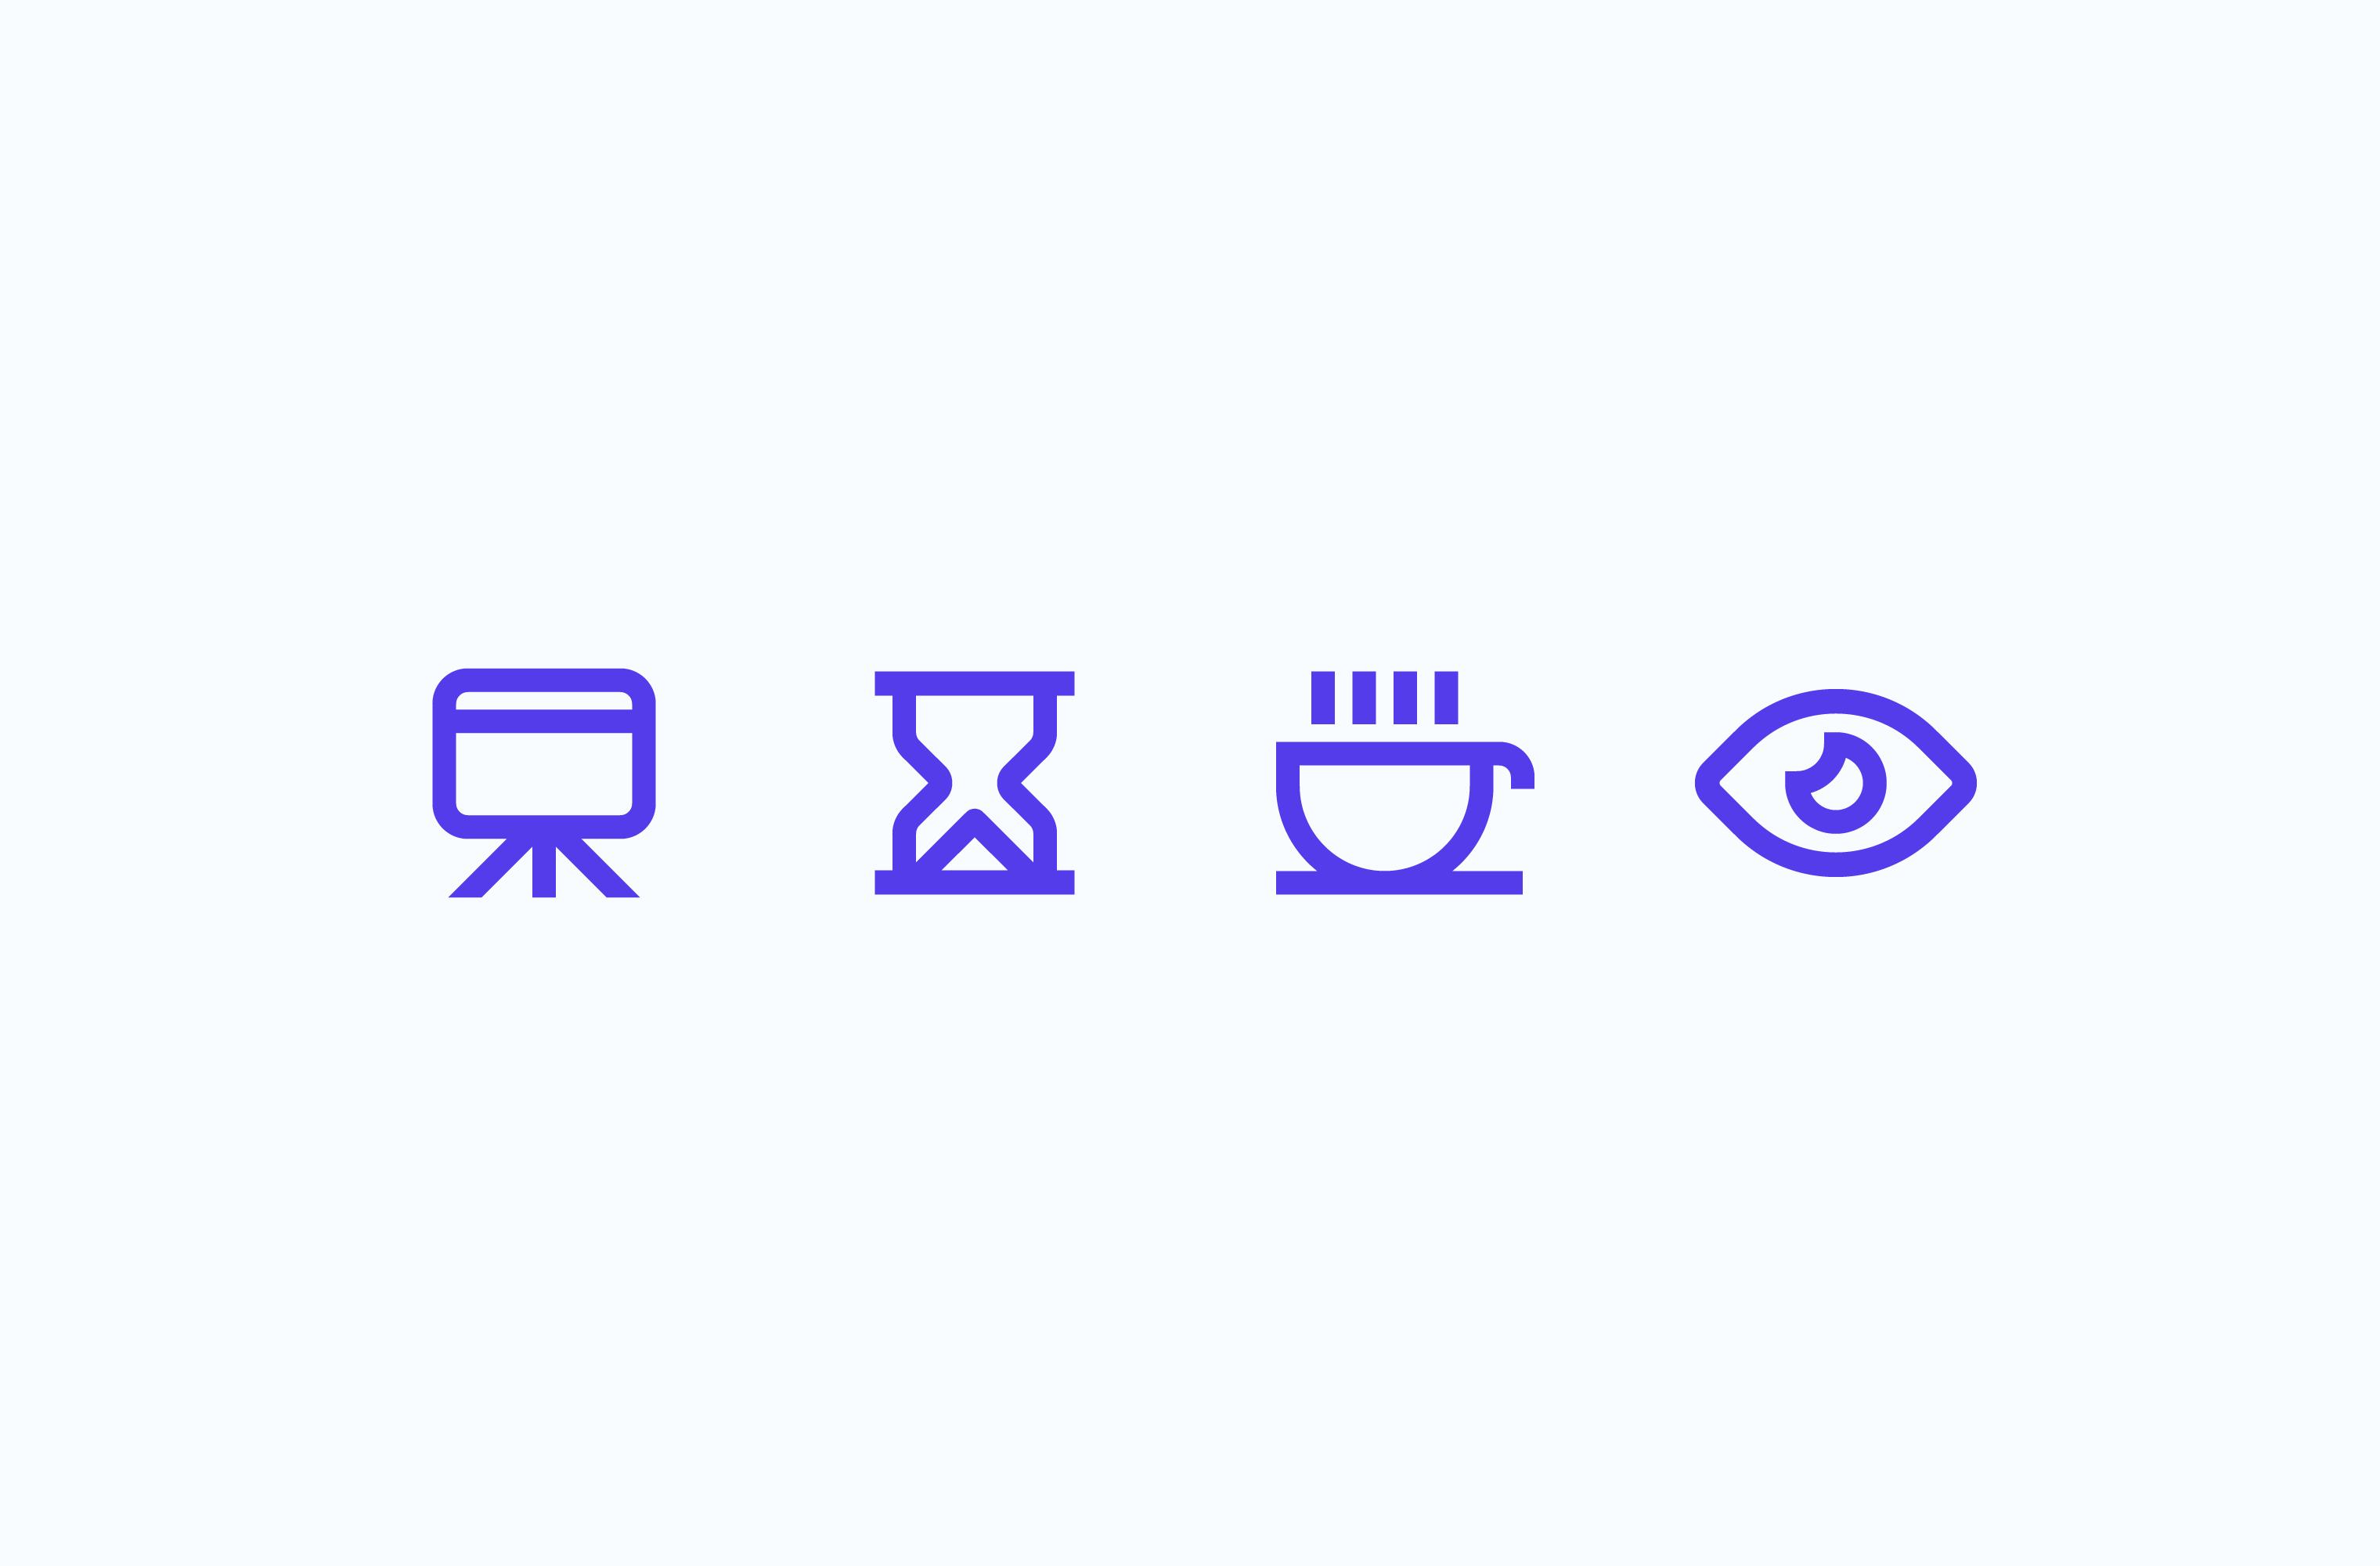 Lightning Talks presentation icon set